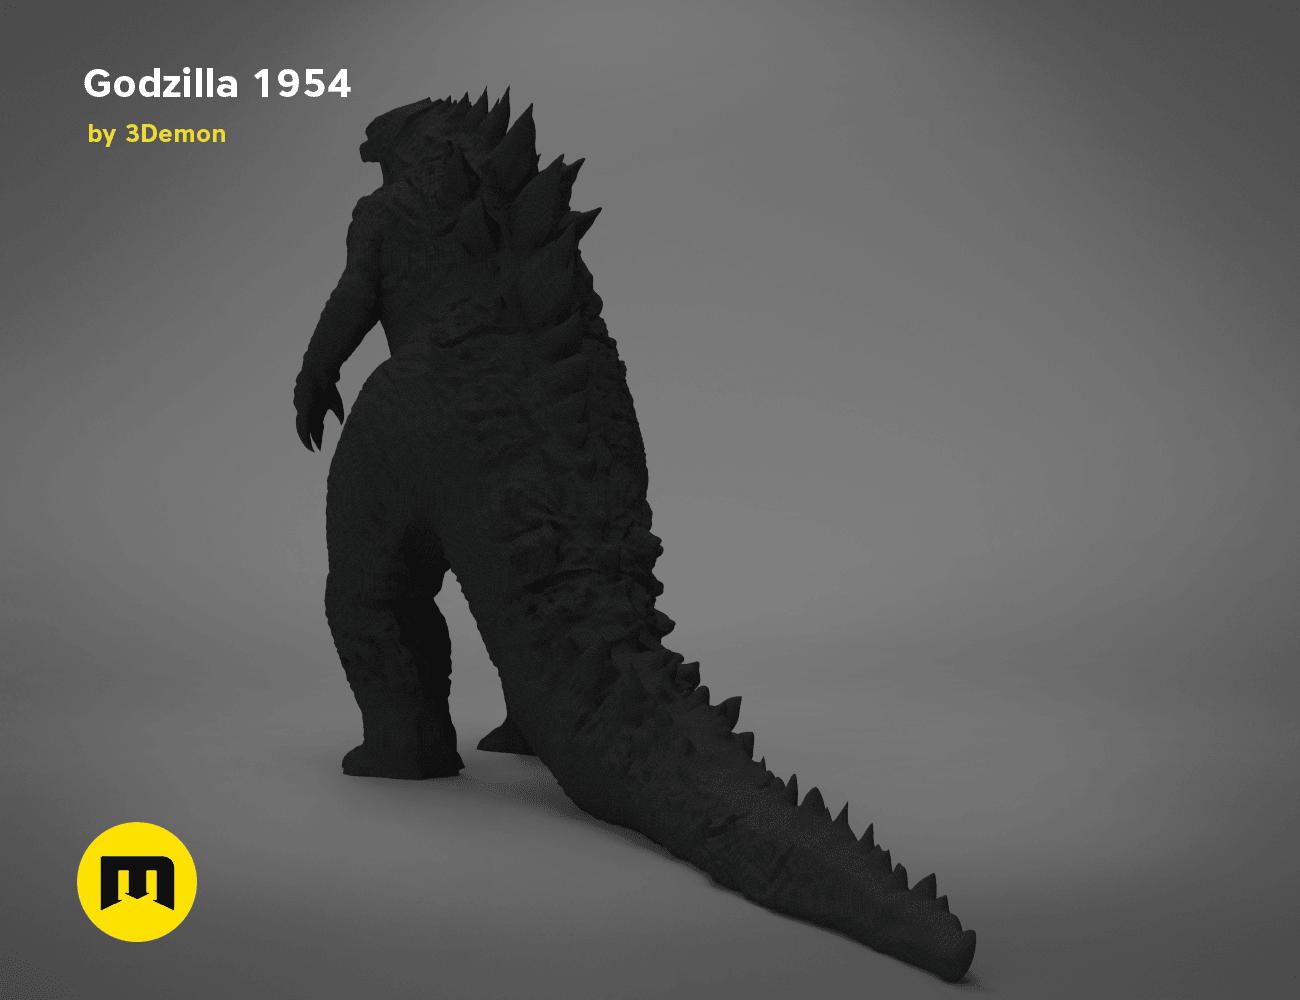 godzilla-black-japanese-main_render_2.194.png Download free OBJ file Godzilla 1954 figure and bottle opener • 3D printer model, 3D-mon